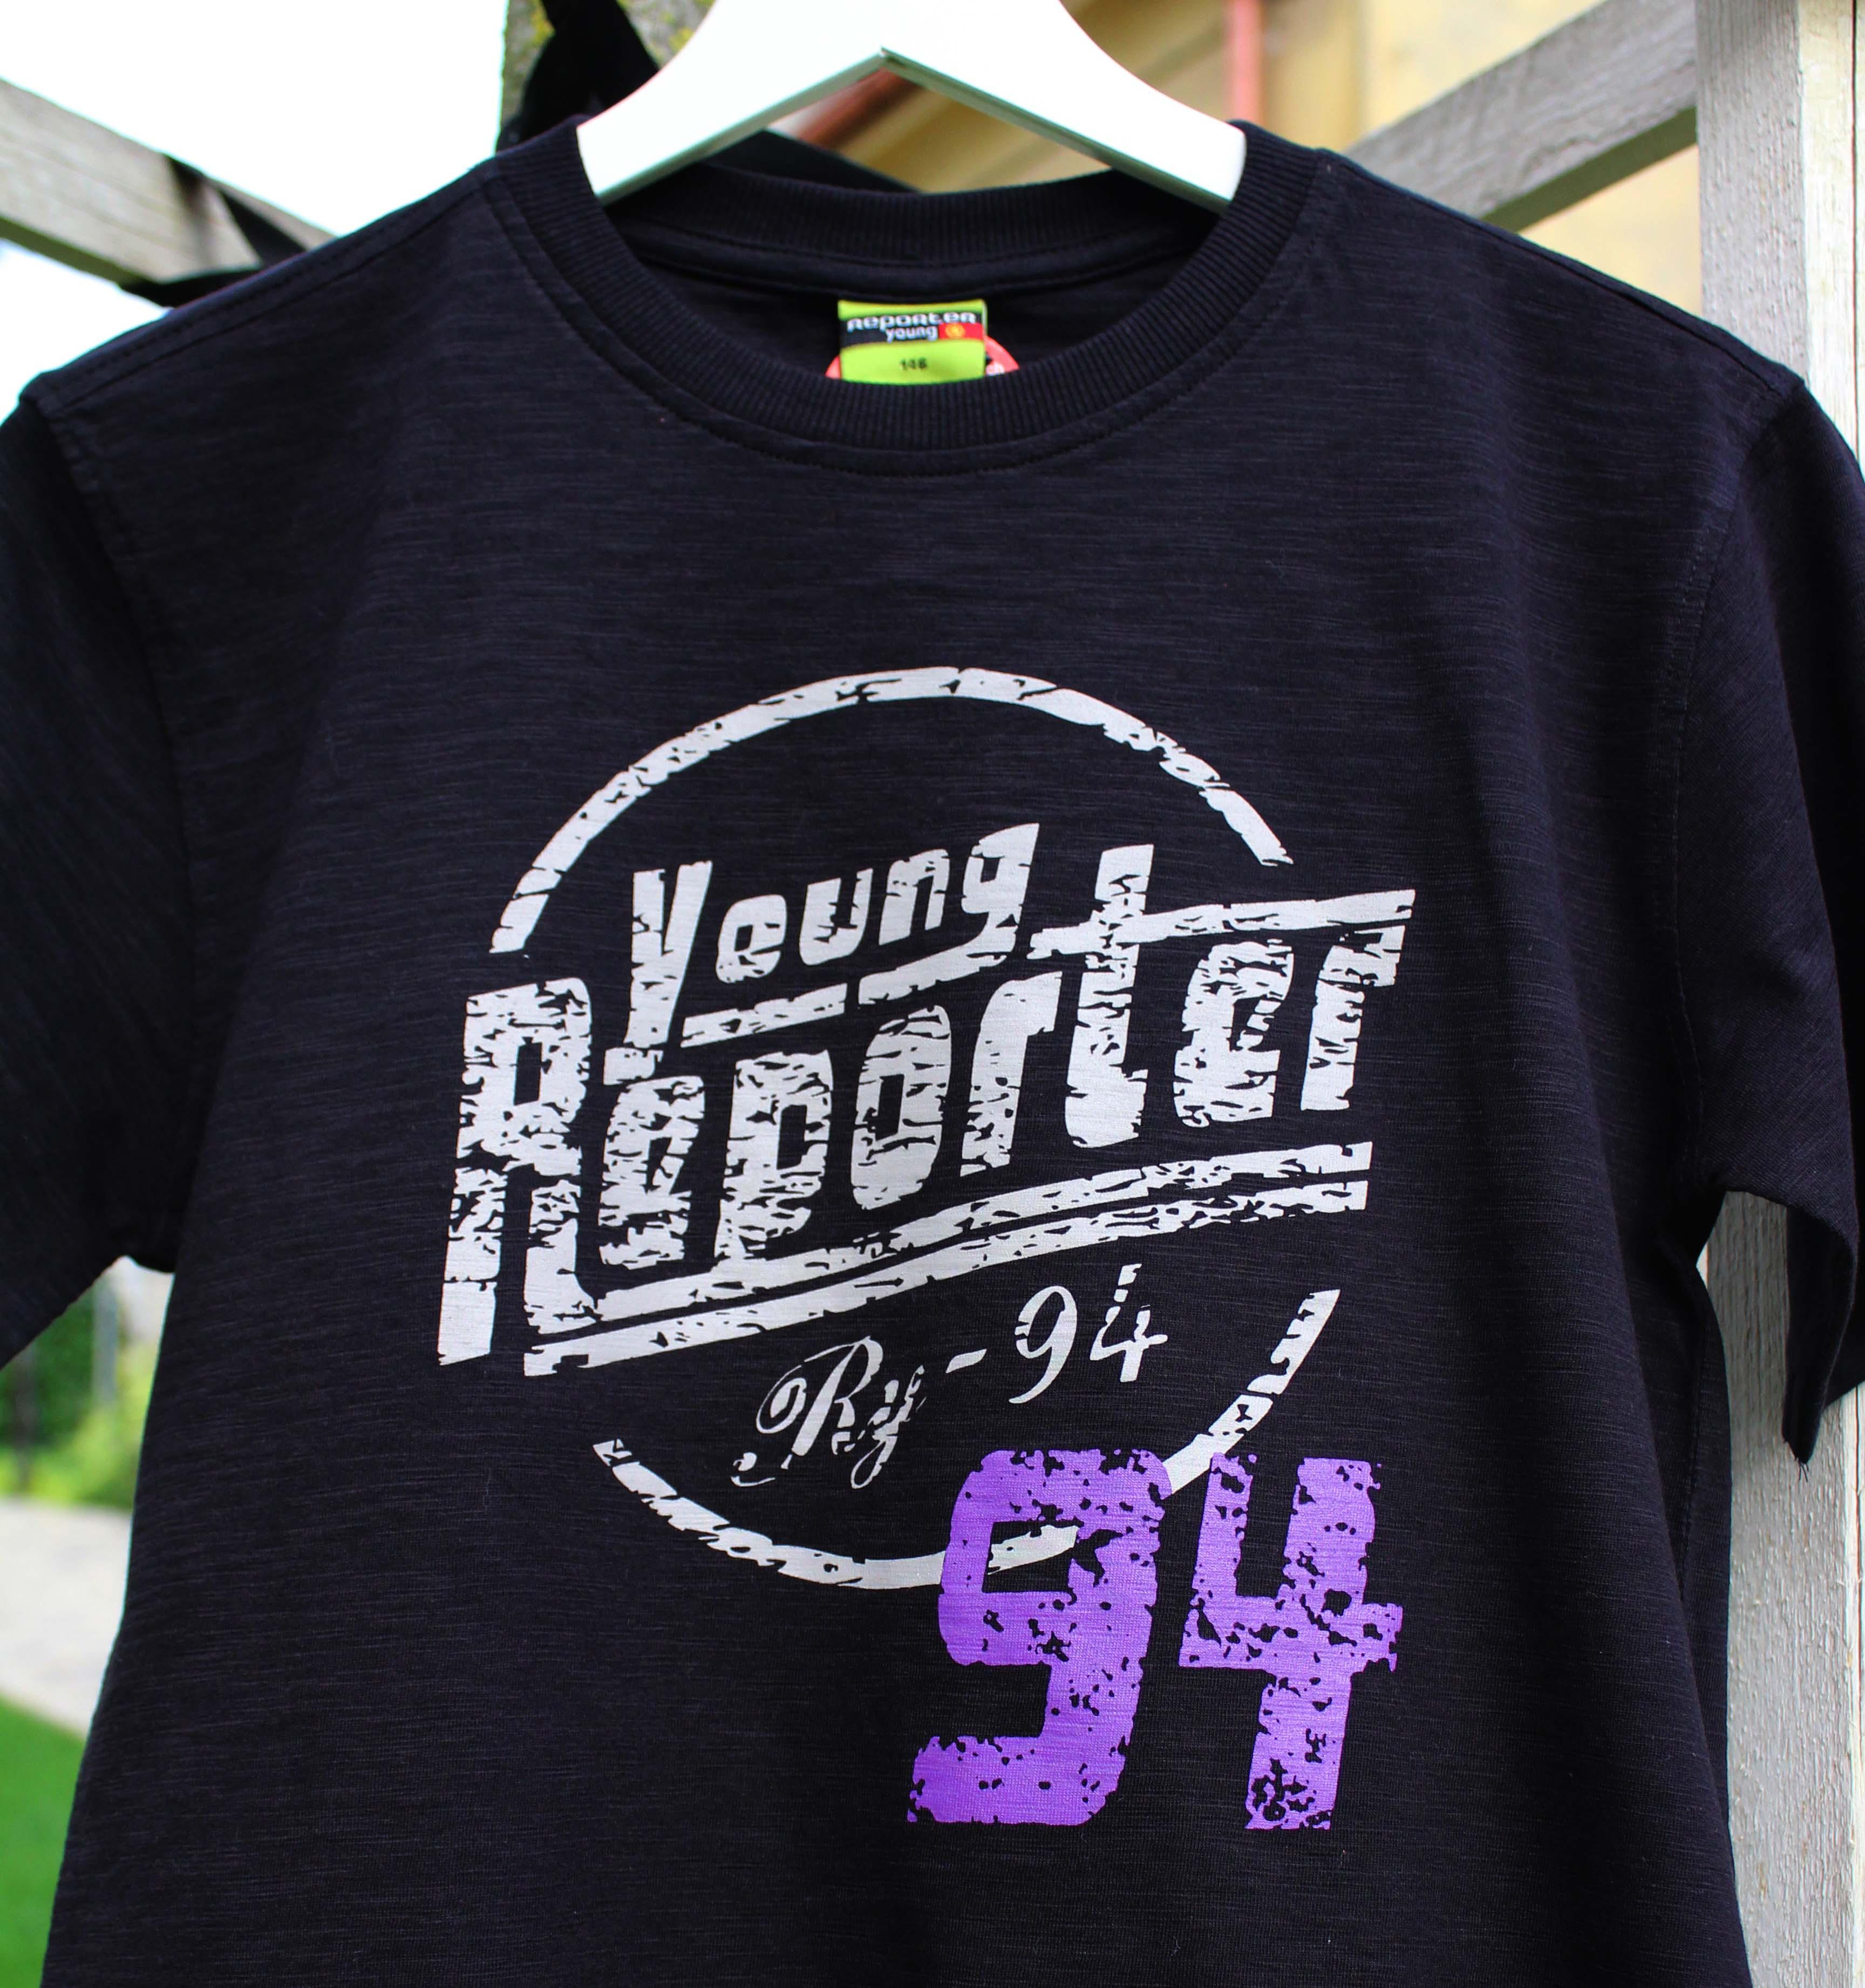 a35e90102023 chlapčenské tričko REPORTER 94. skladom